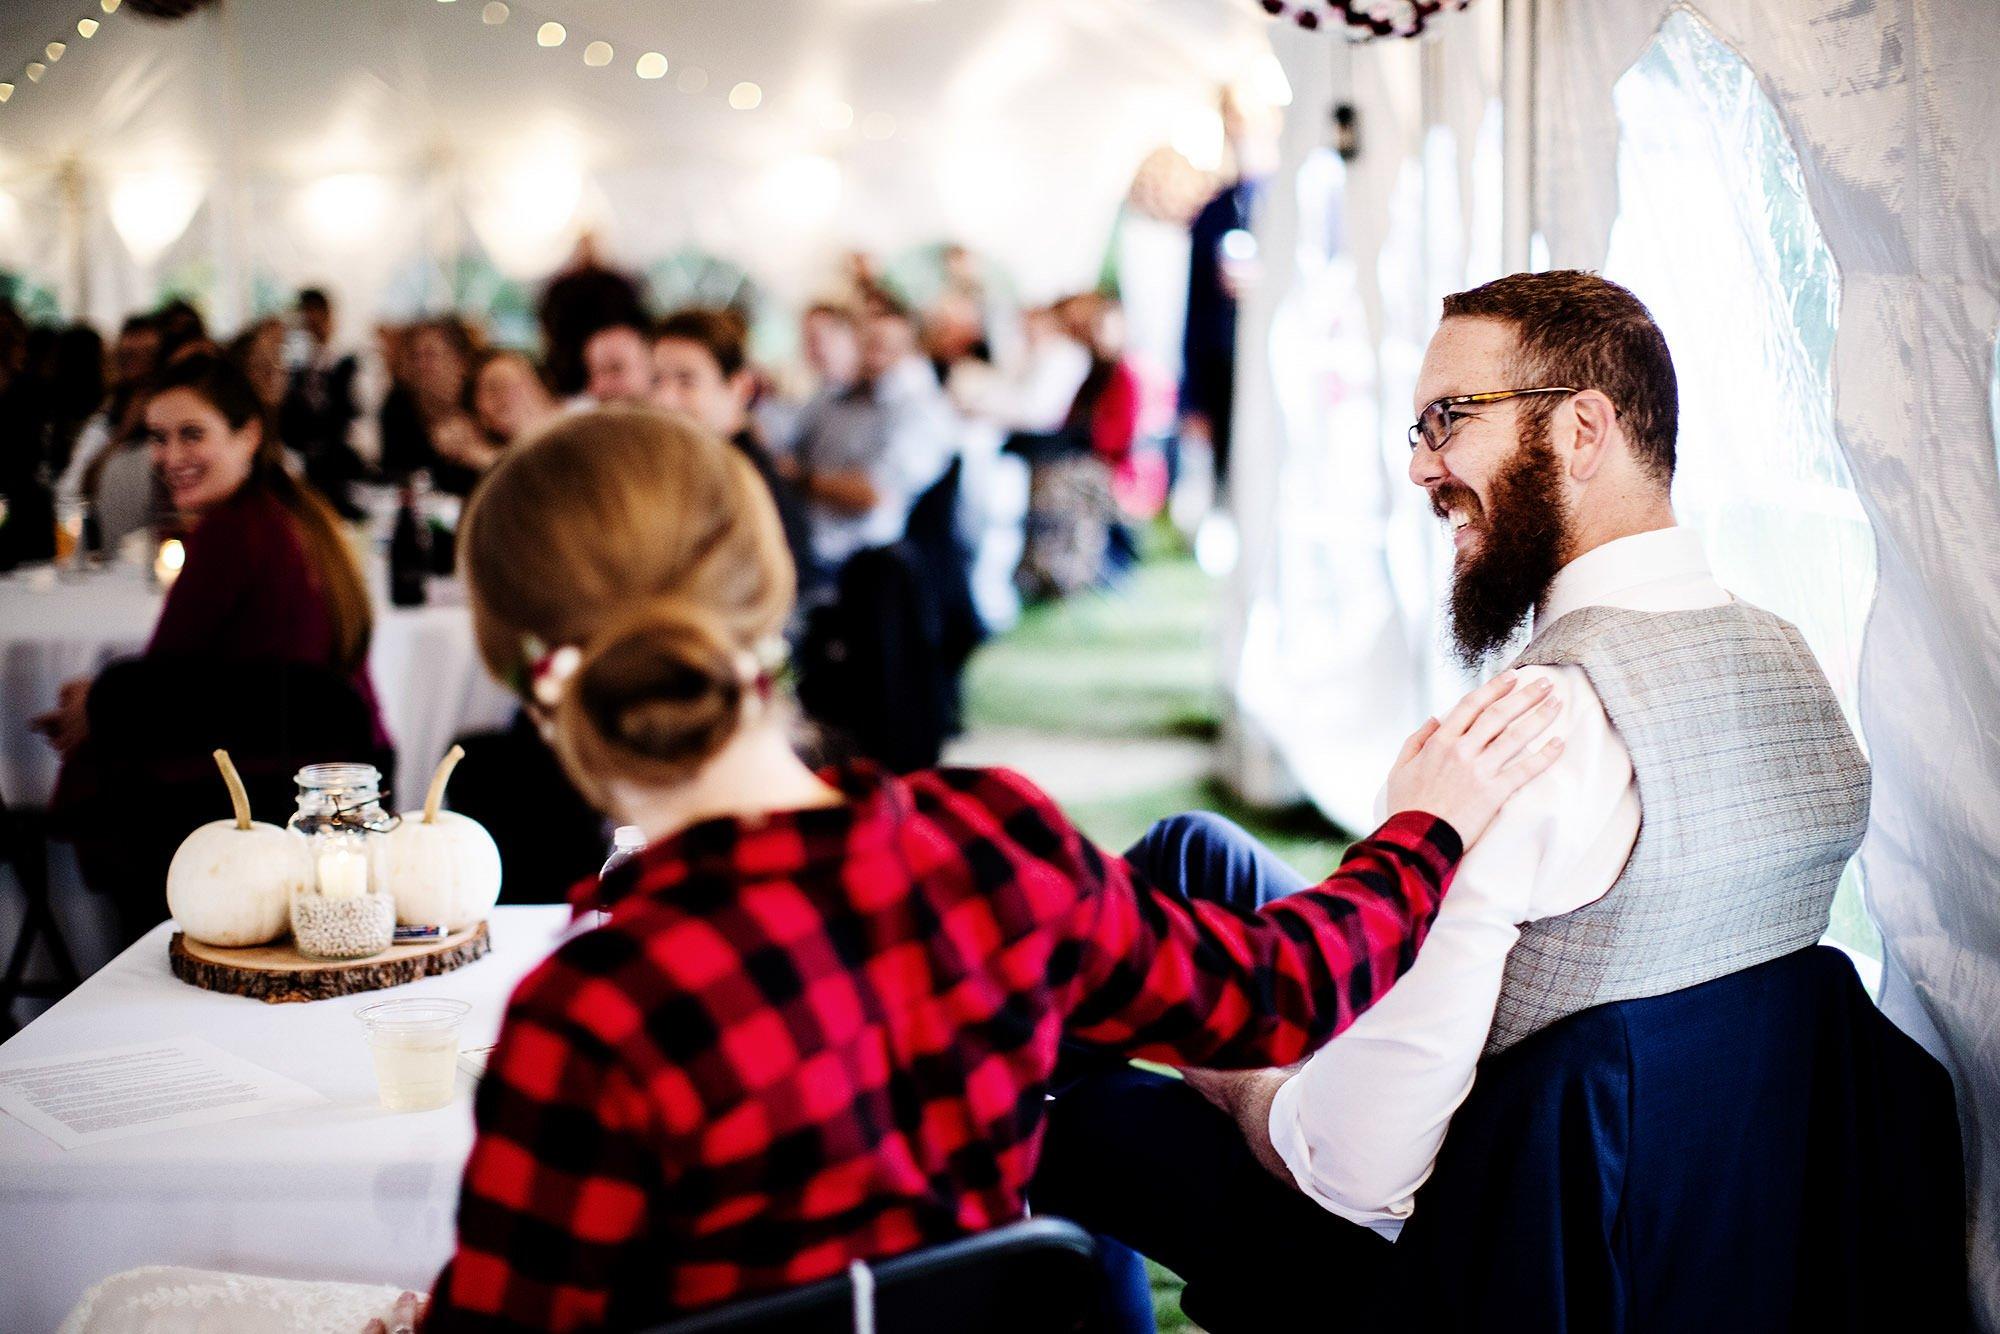 Massachusetts Backyard Wedding  I  The groom smiles during toasts in Westford, MA.